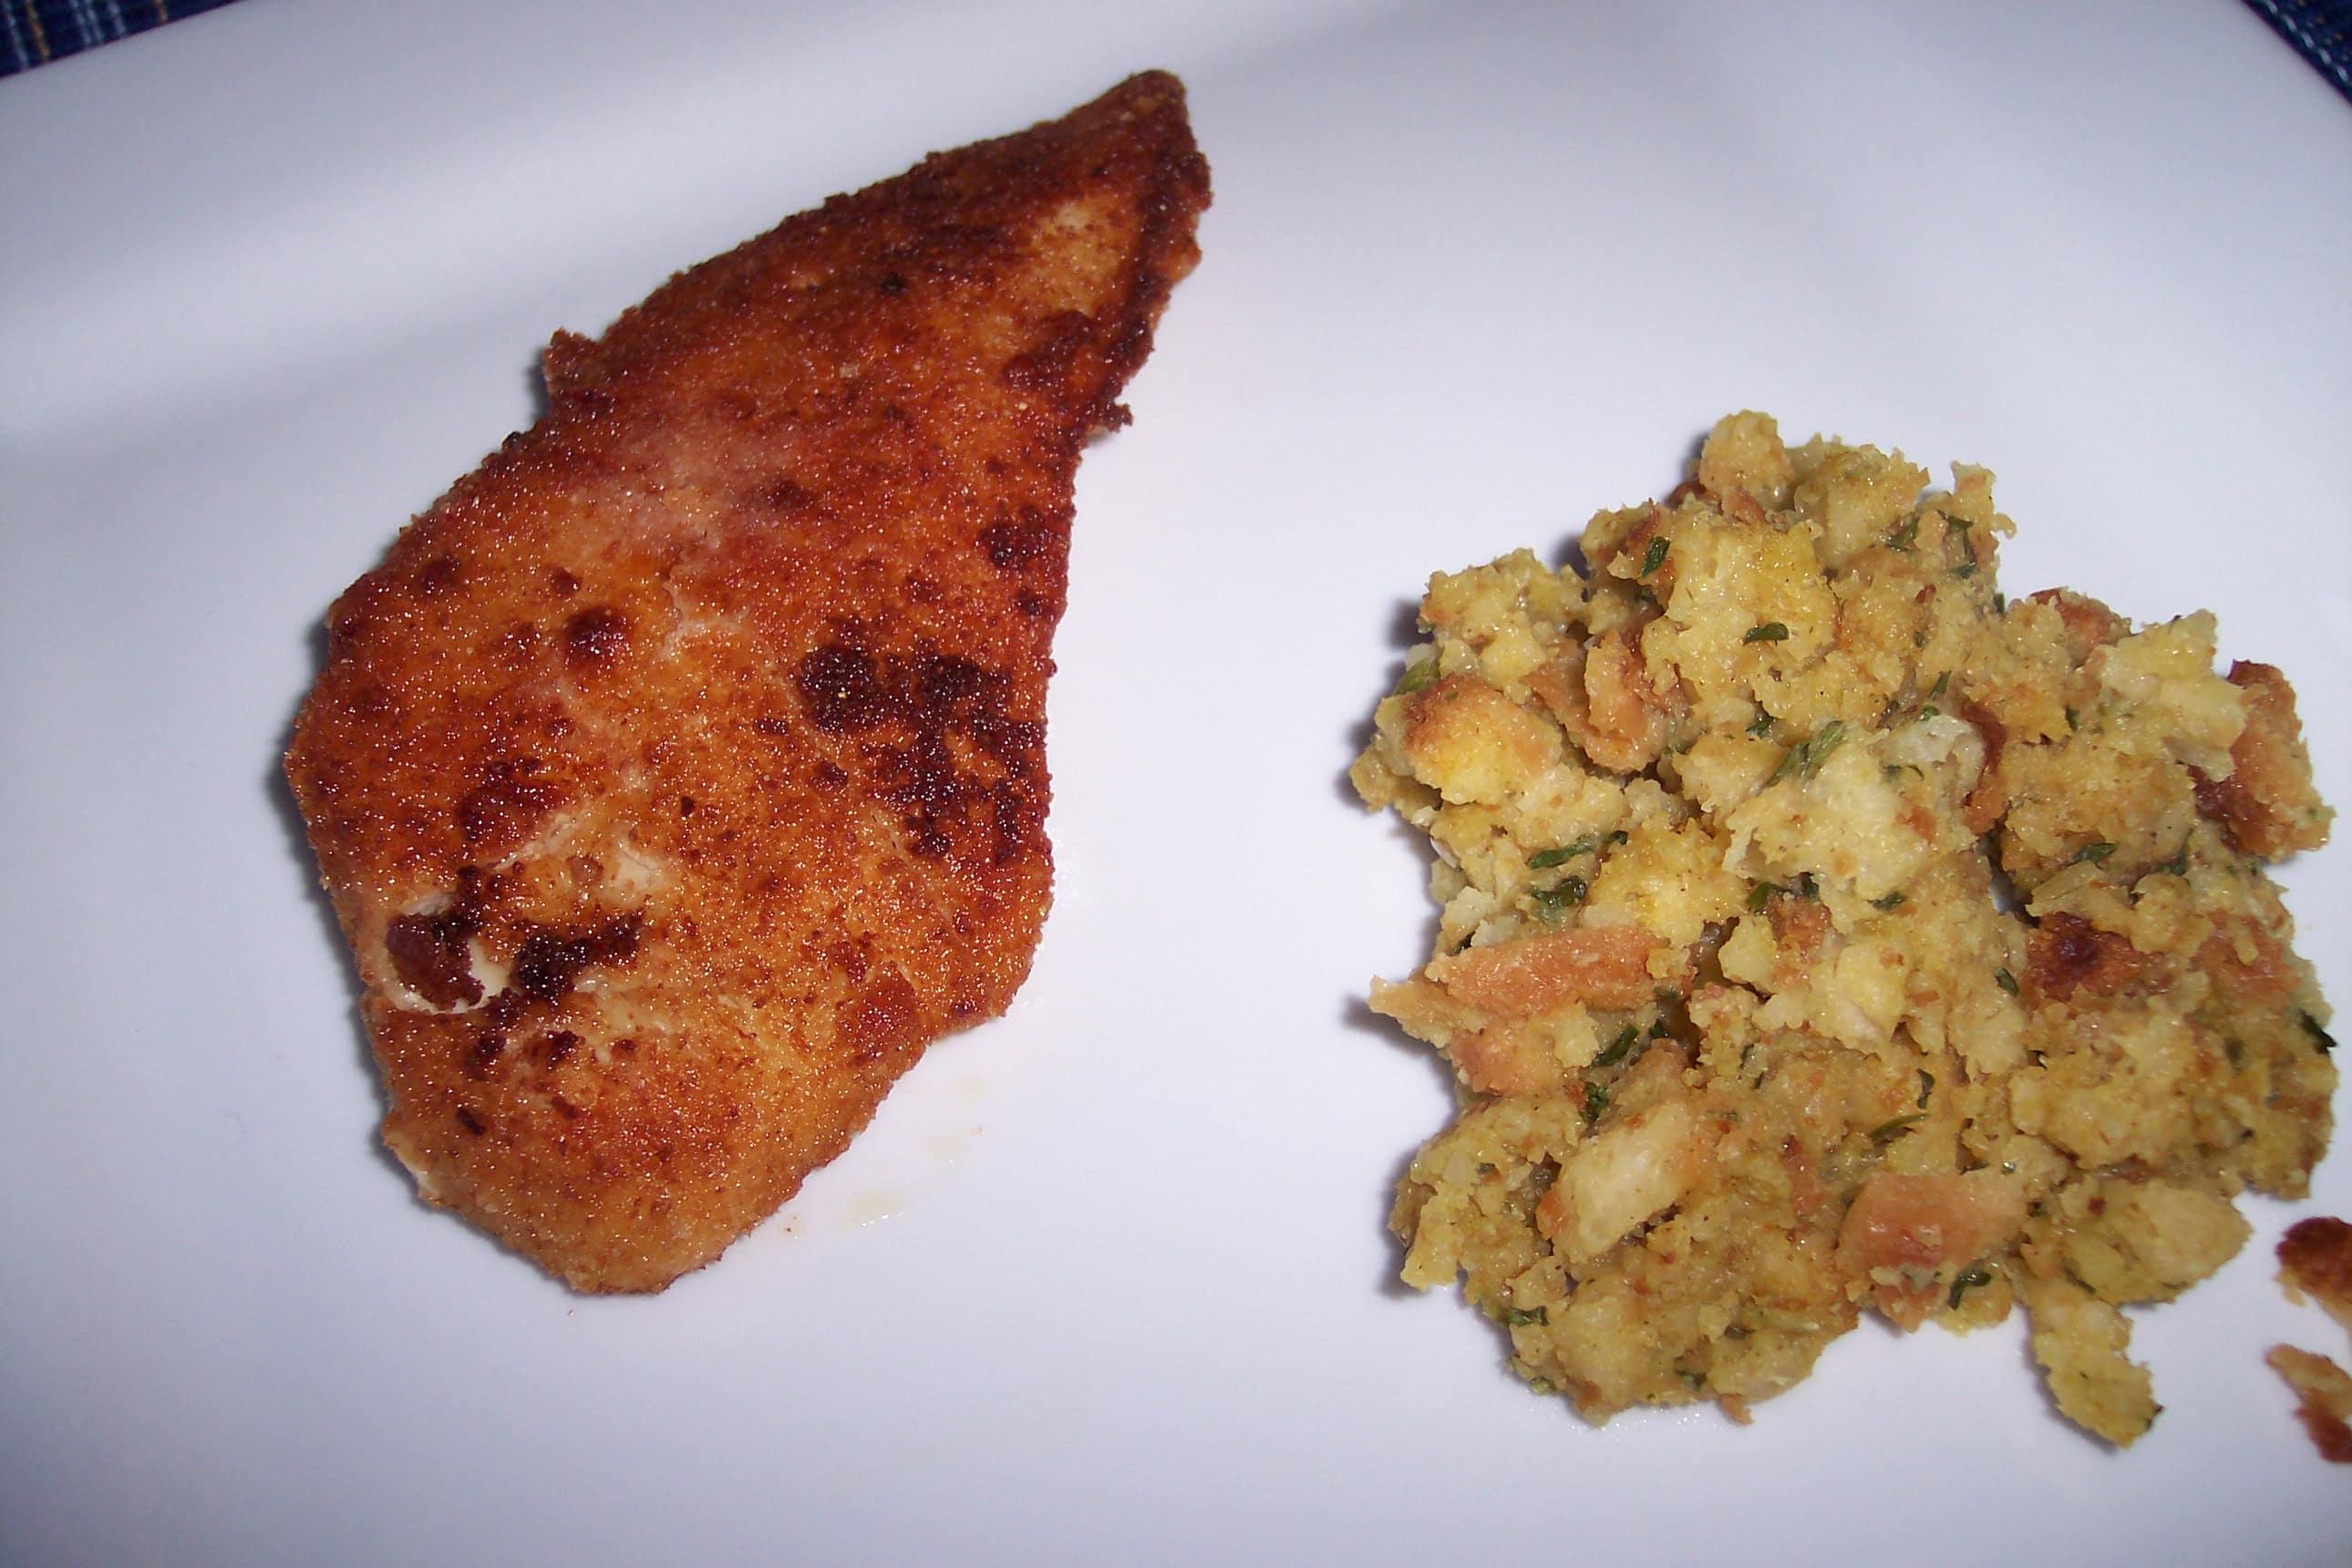 Weight Watchers Baked Chicken Recipes